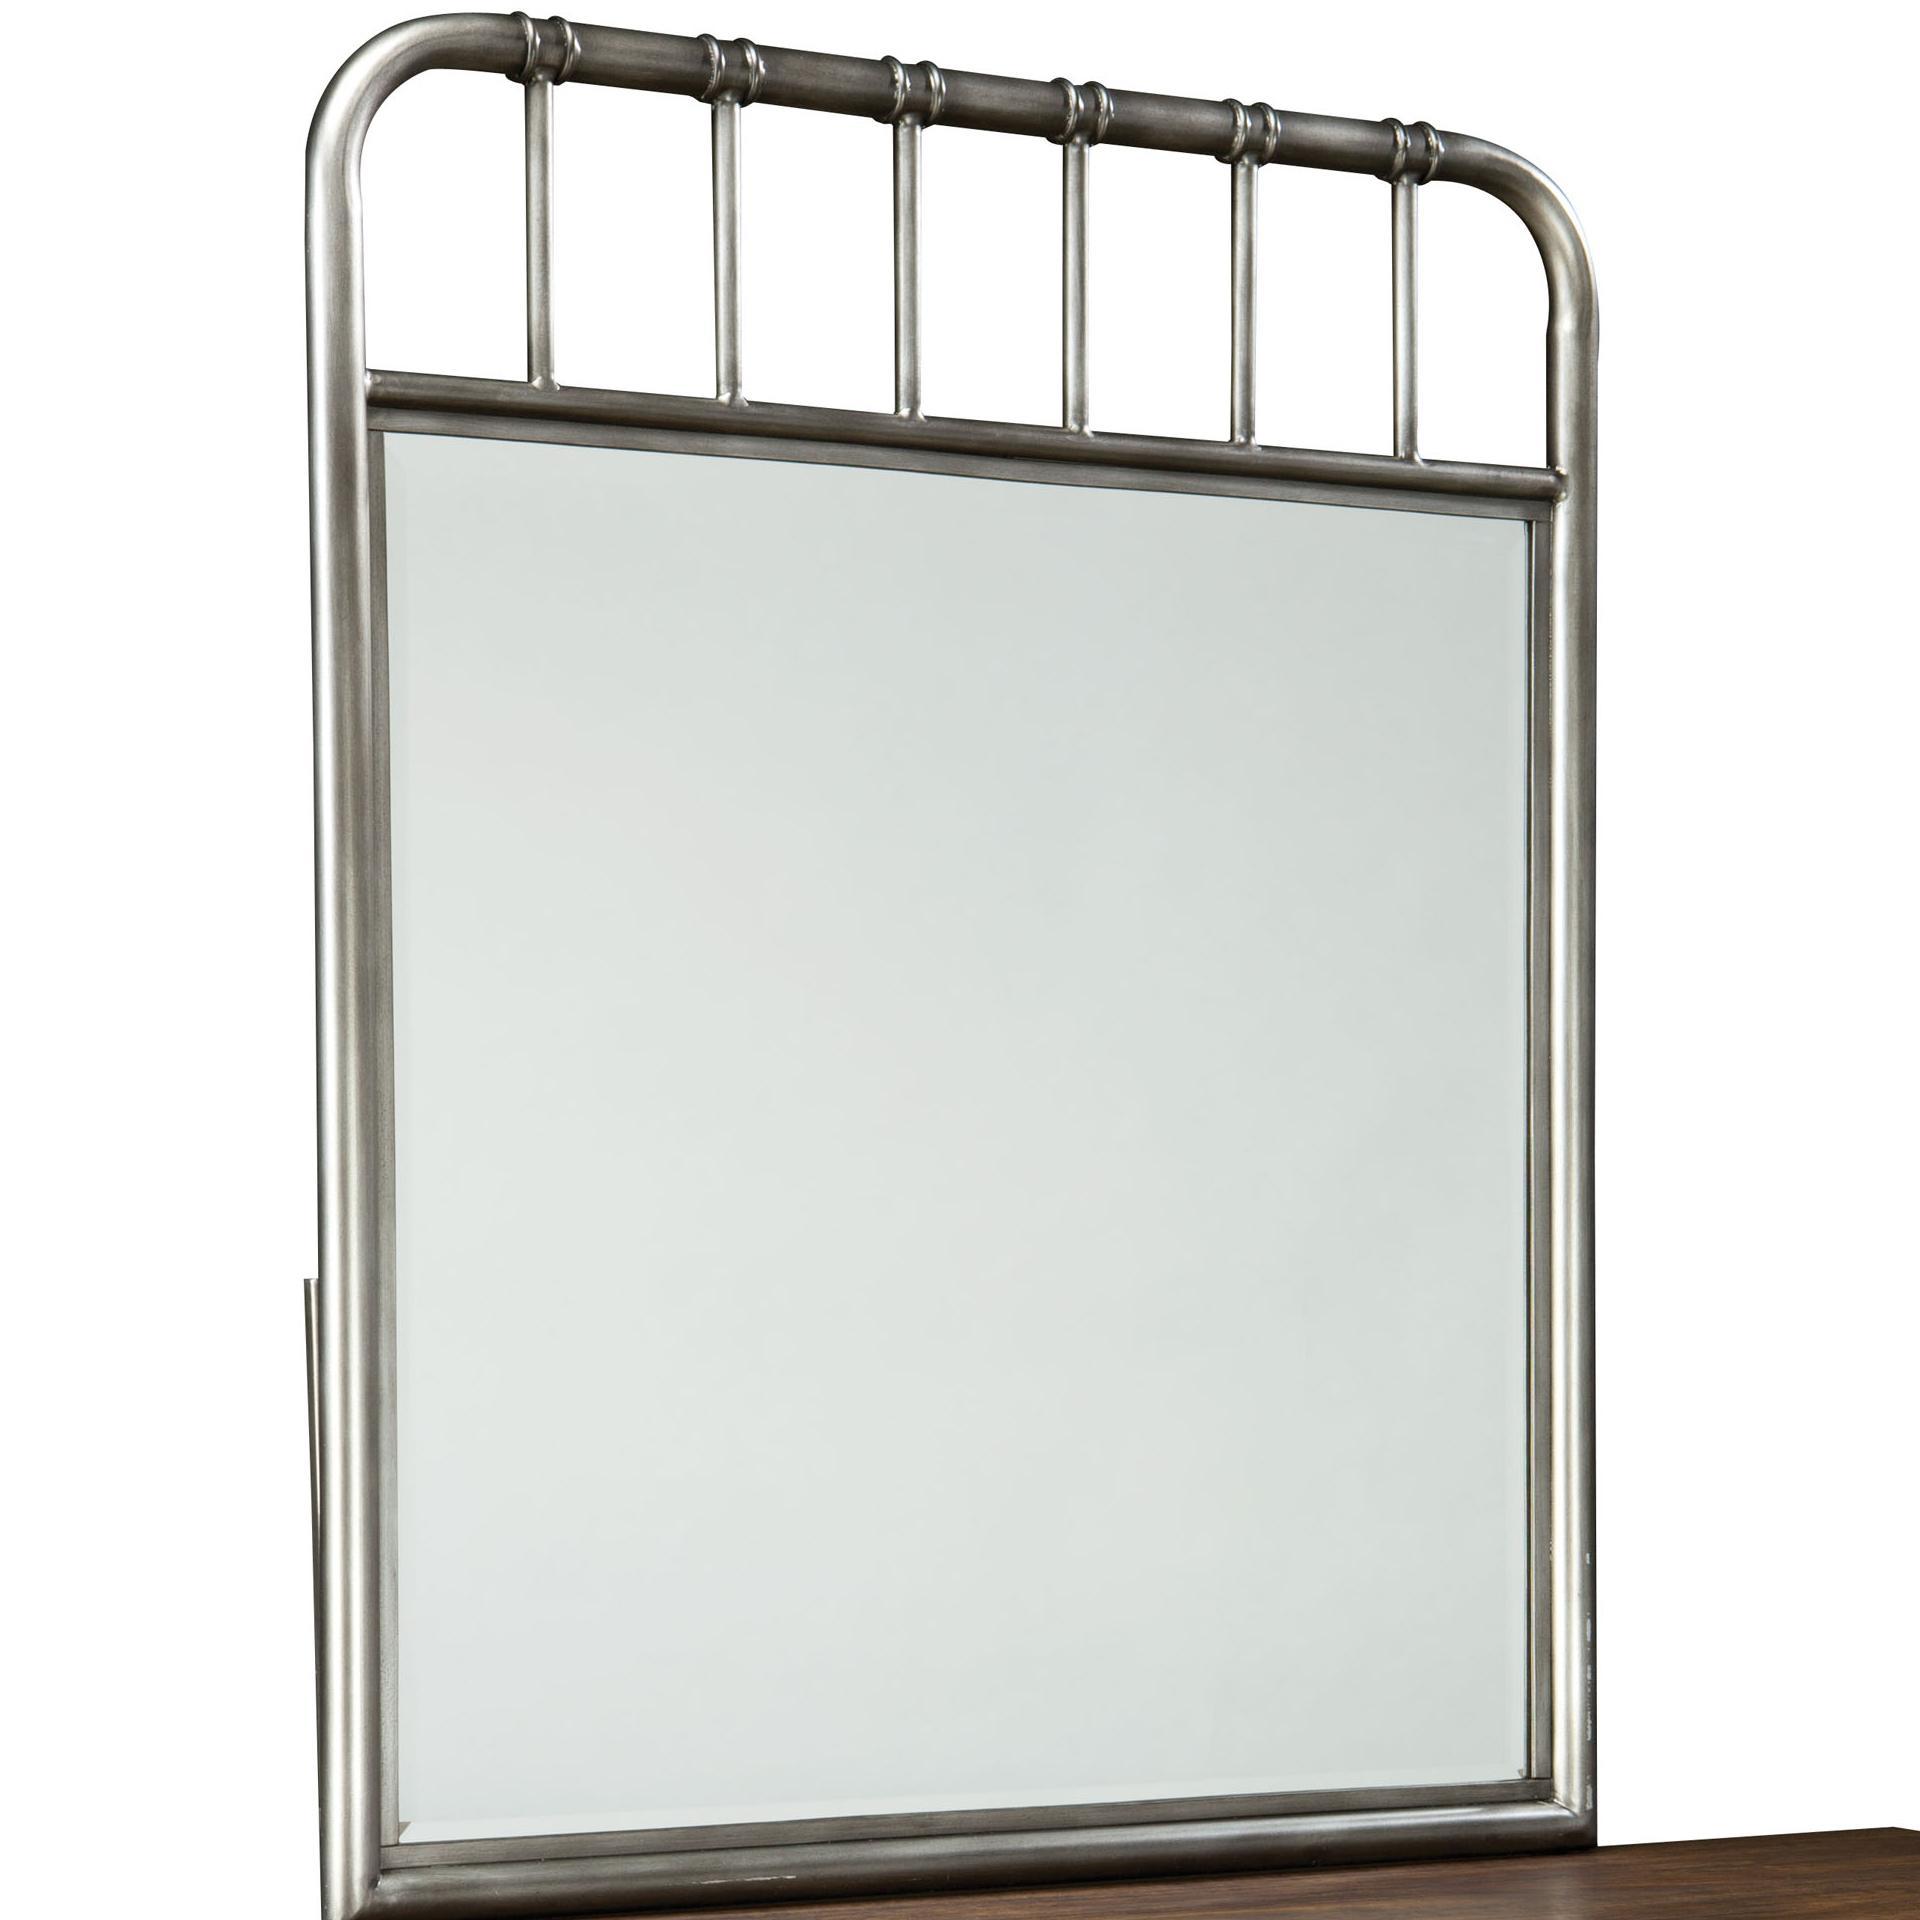 Standard Furniture Tristen Dresser Mirror - Item Number: 87508